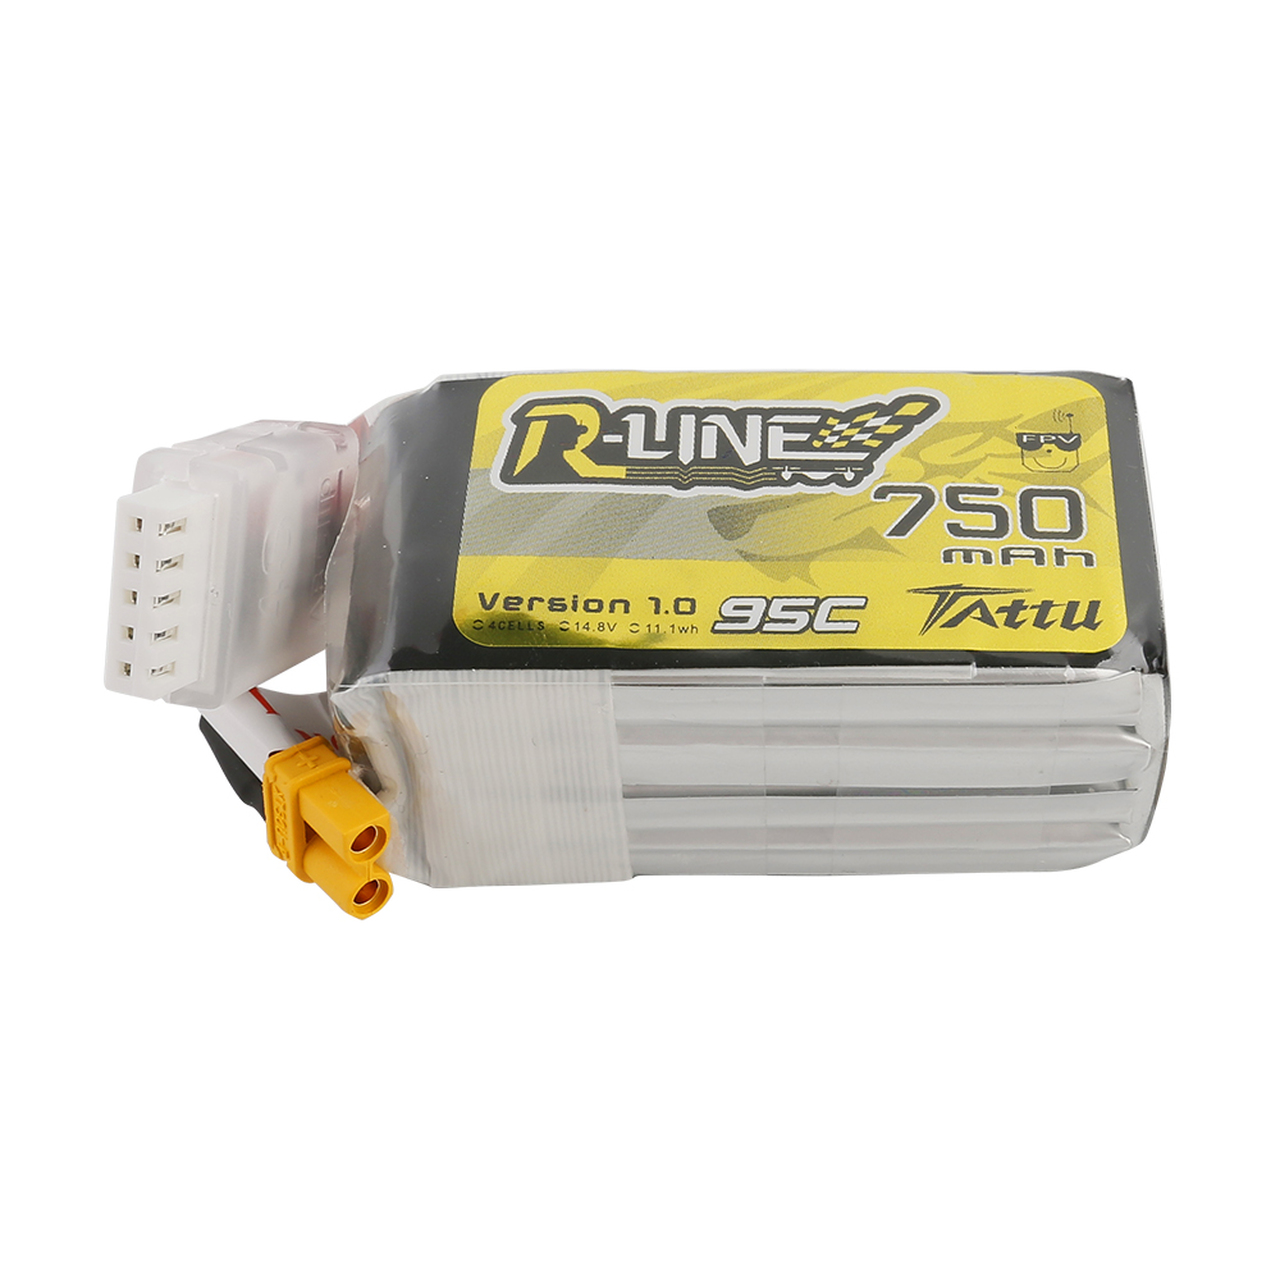 Tattu R-Line 750mAh 14.8V 95C 4S1P Lipo Battery Pack with XT30 Plug